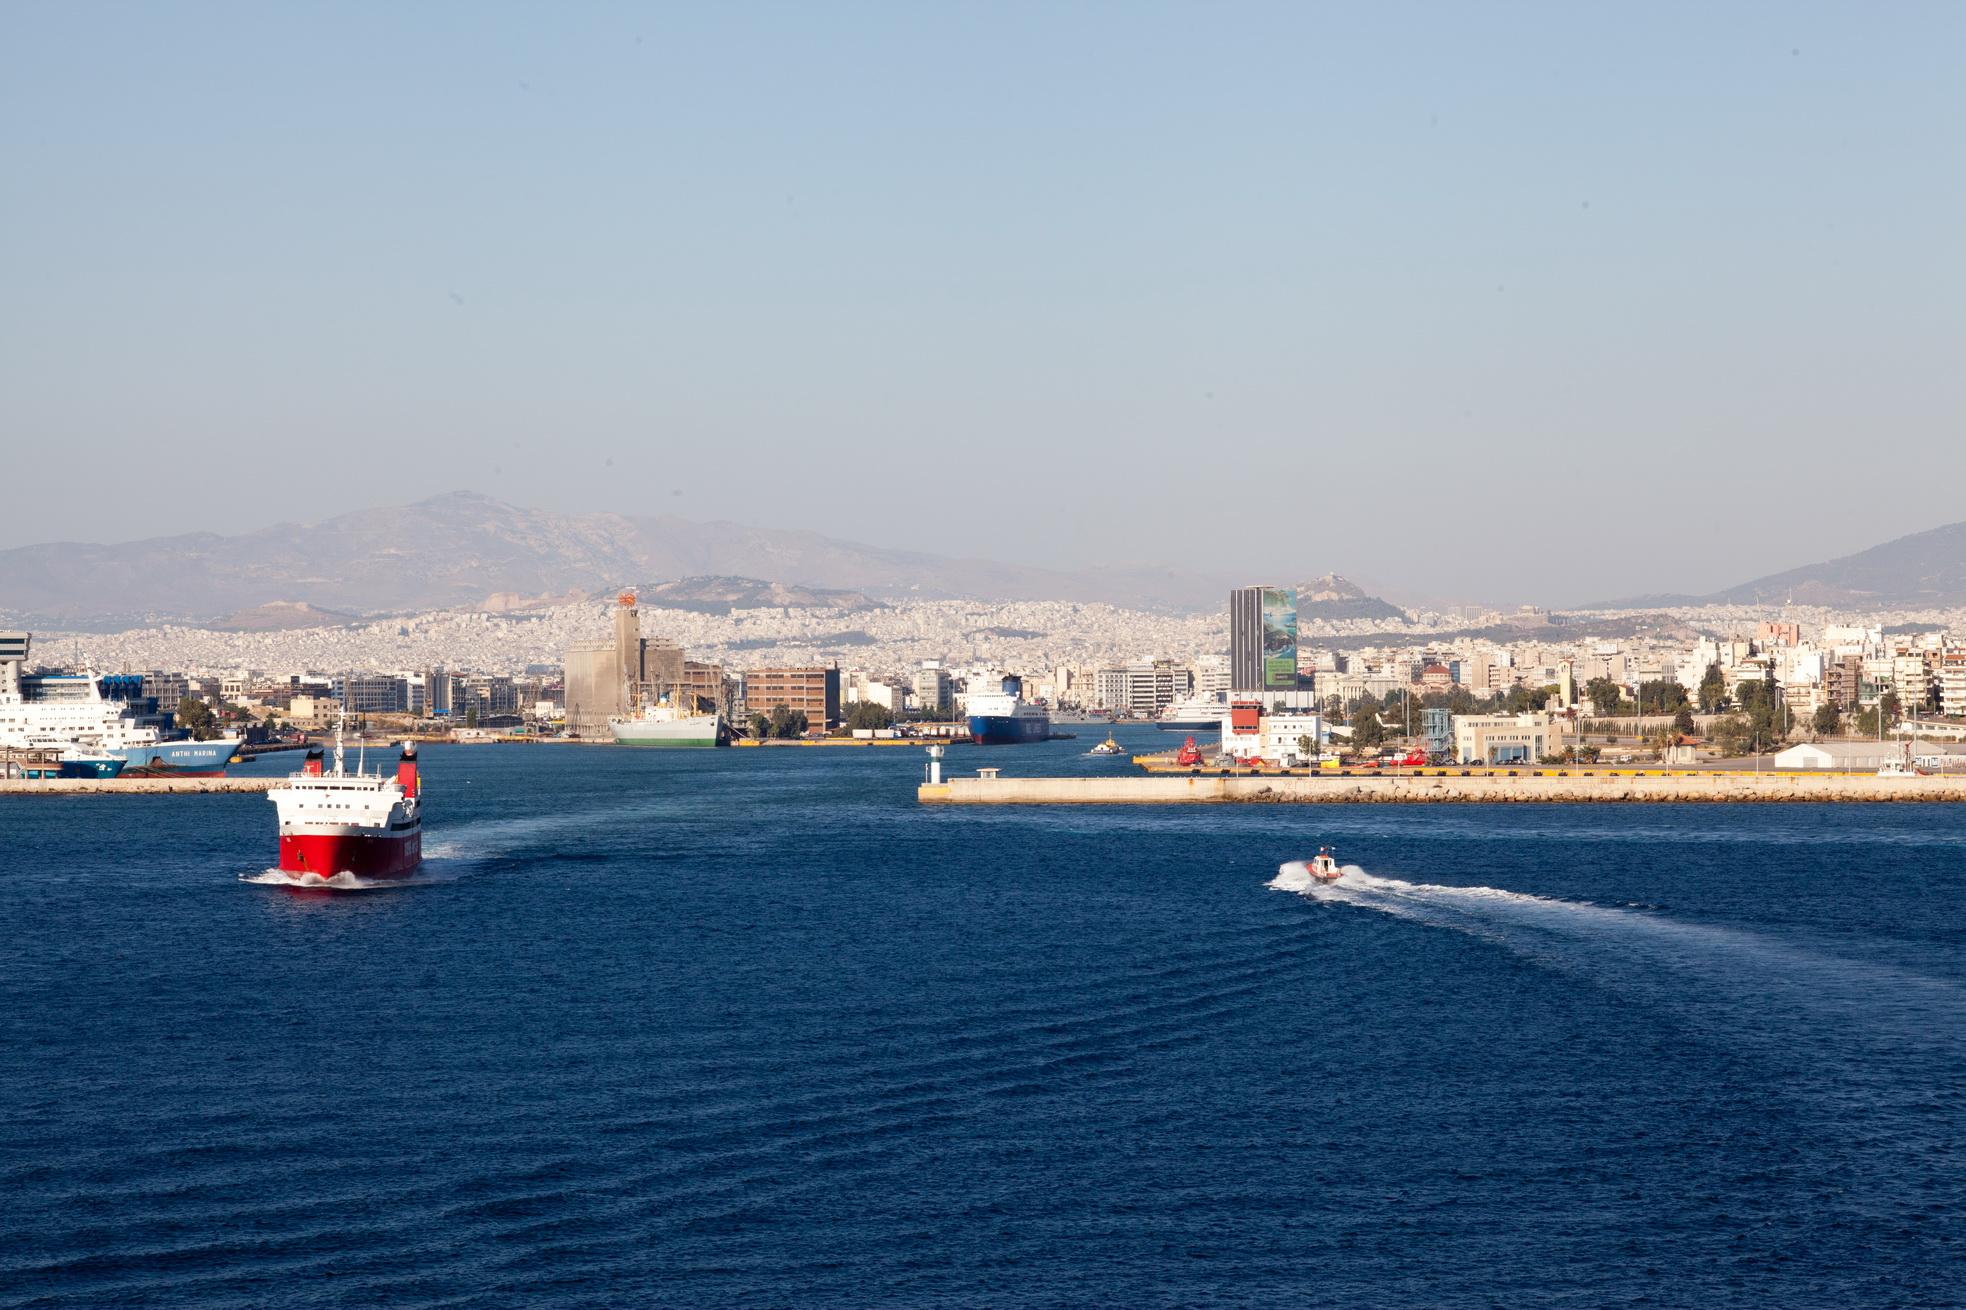 MS Phivos IMO 7825978 Nova Ferries leaving Piraeus Port of Athens Greece 01